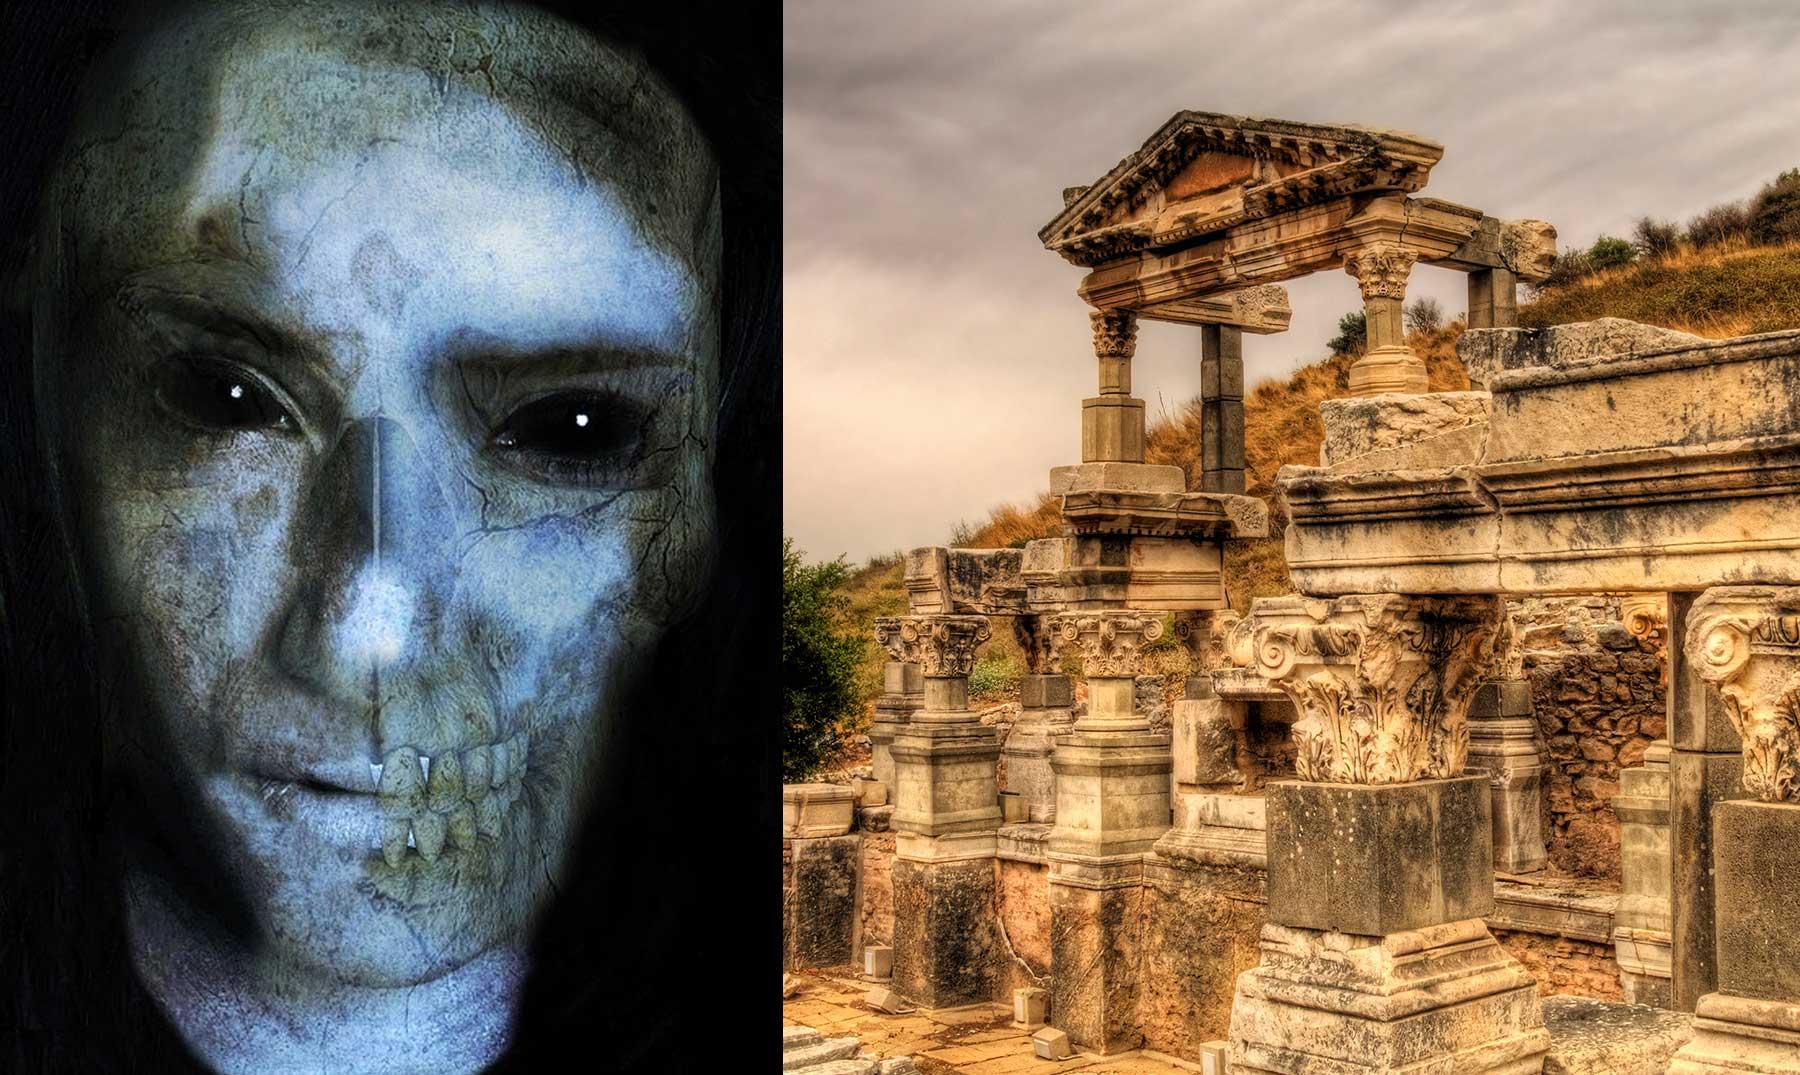 Tumbas zombi en la antigua grecia supercurioso for Costumbres de grecia